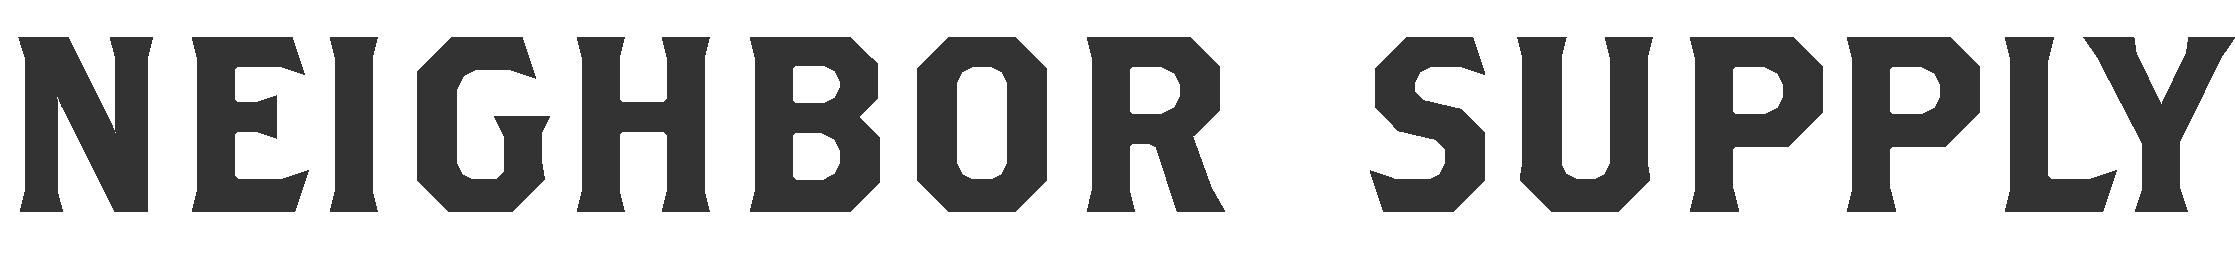 NEIGHBOR SUPPLY Logo